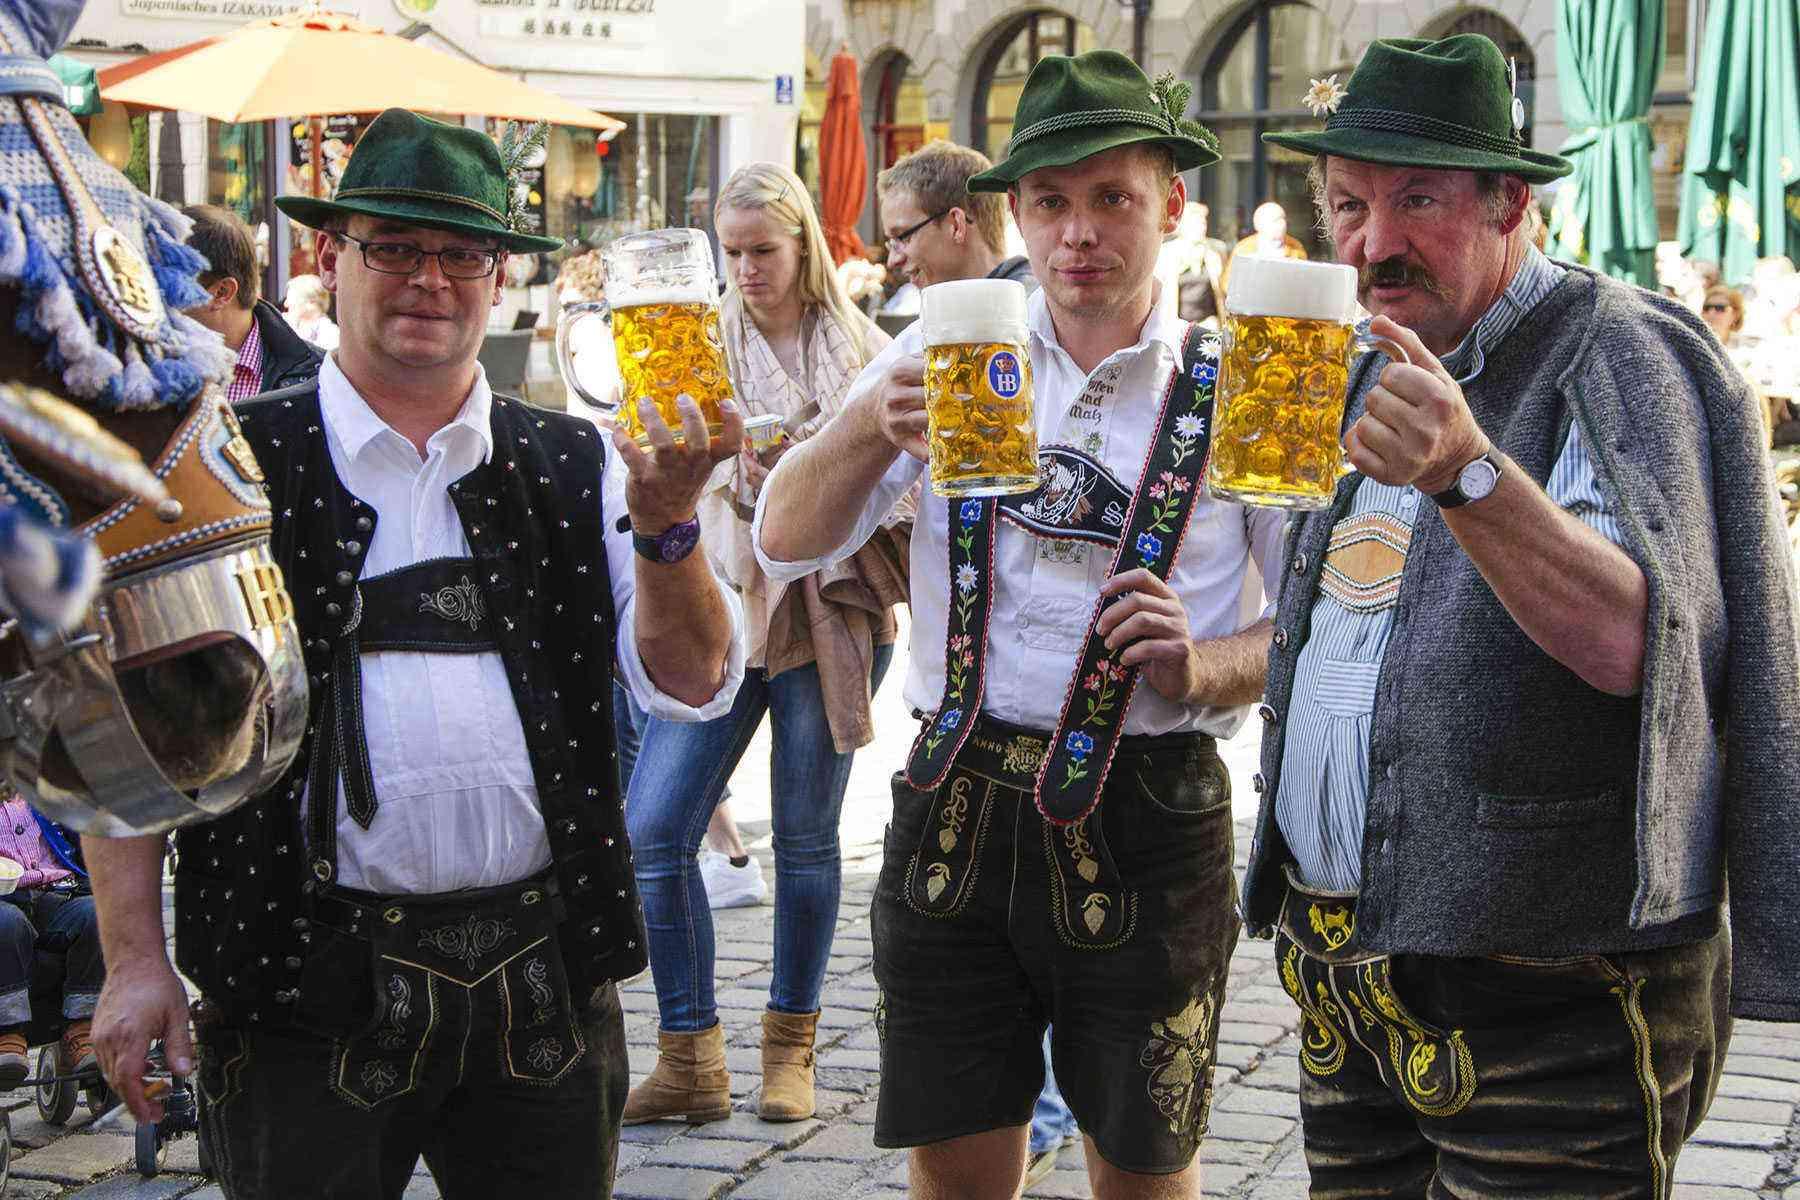 10 Tips For Surviving Oktoberfest Fodors Travel Guide